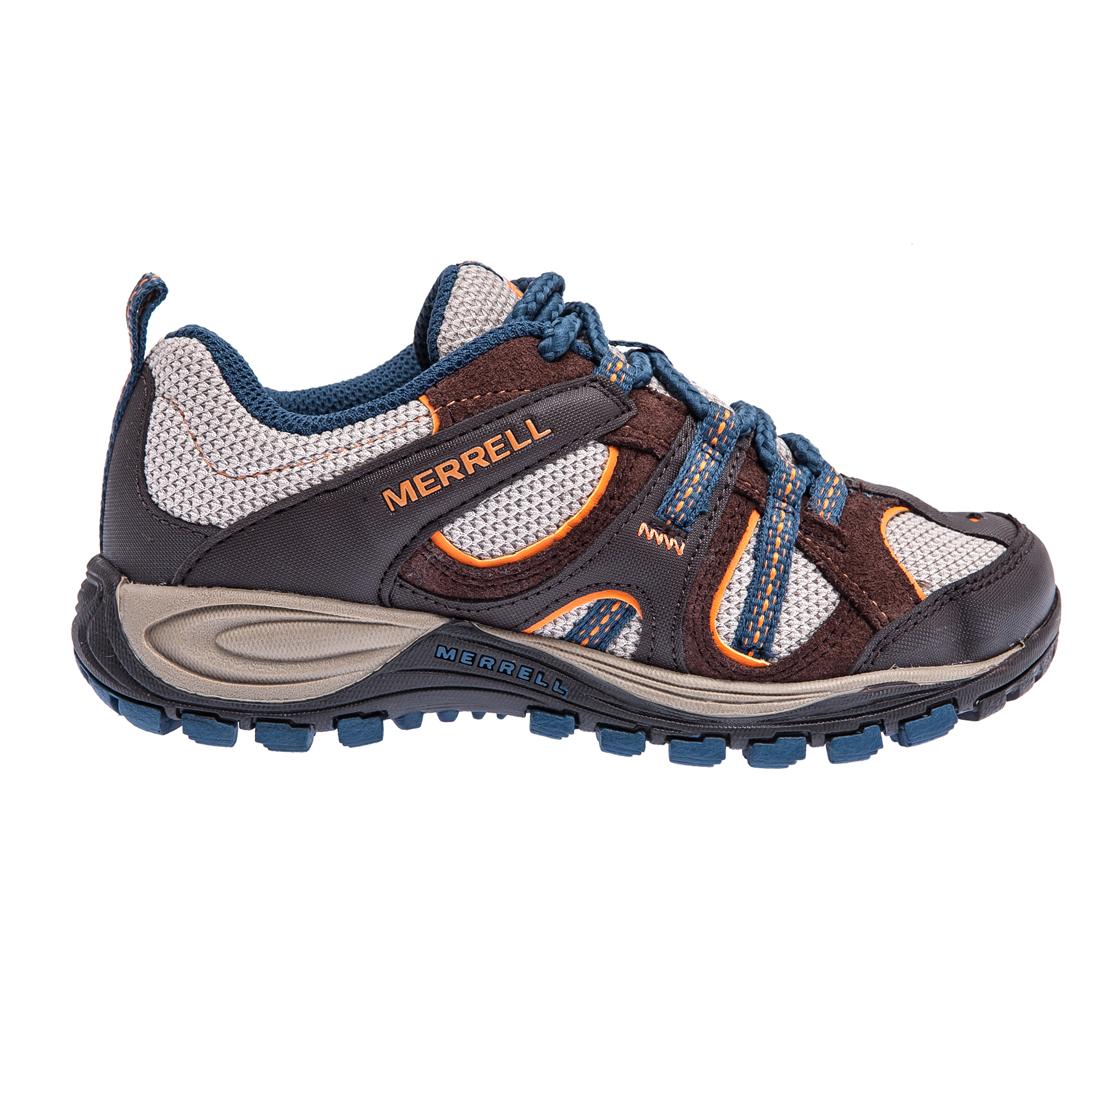 MERRELL – Παιδικά παπούτσια Yokota Trail Ventilator MERREL καφέ